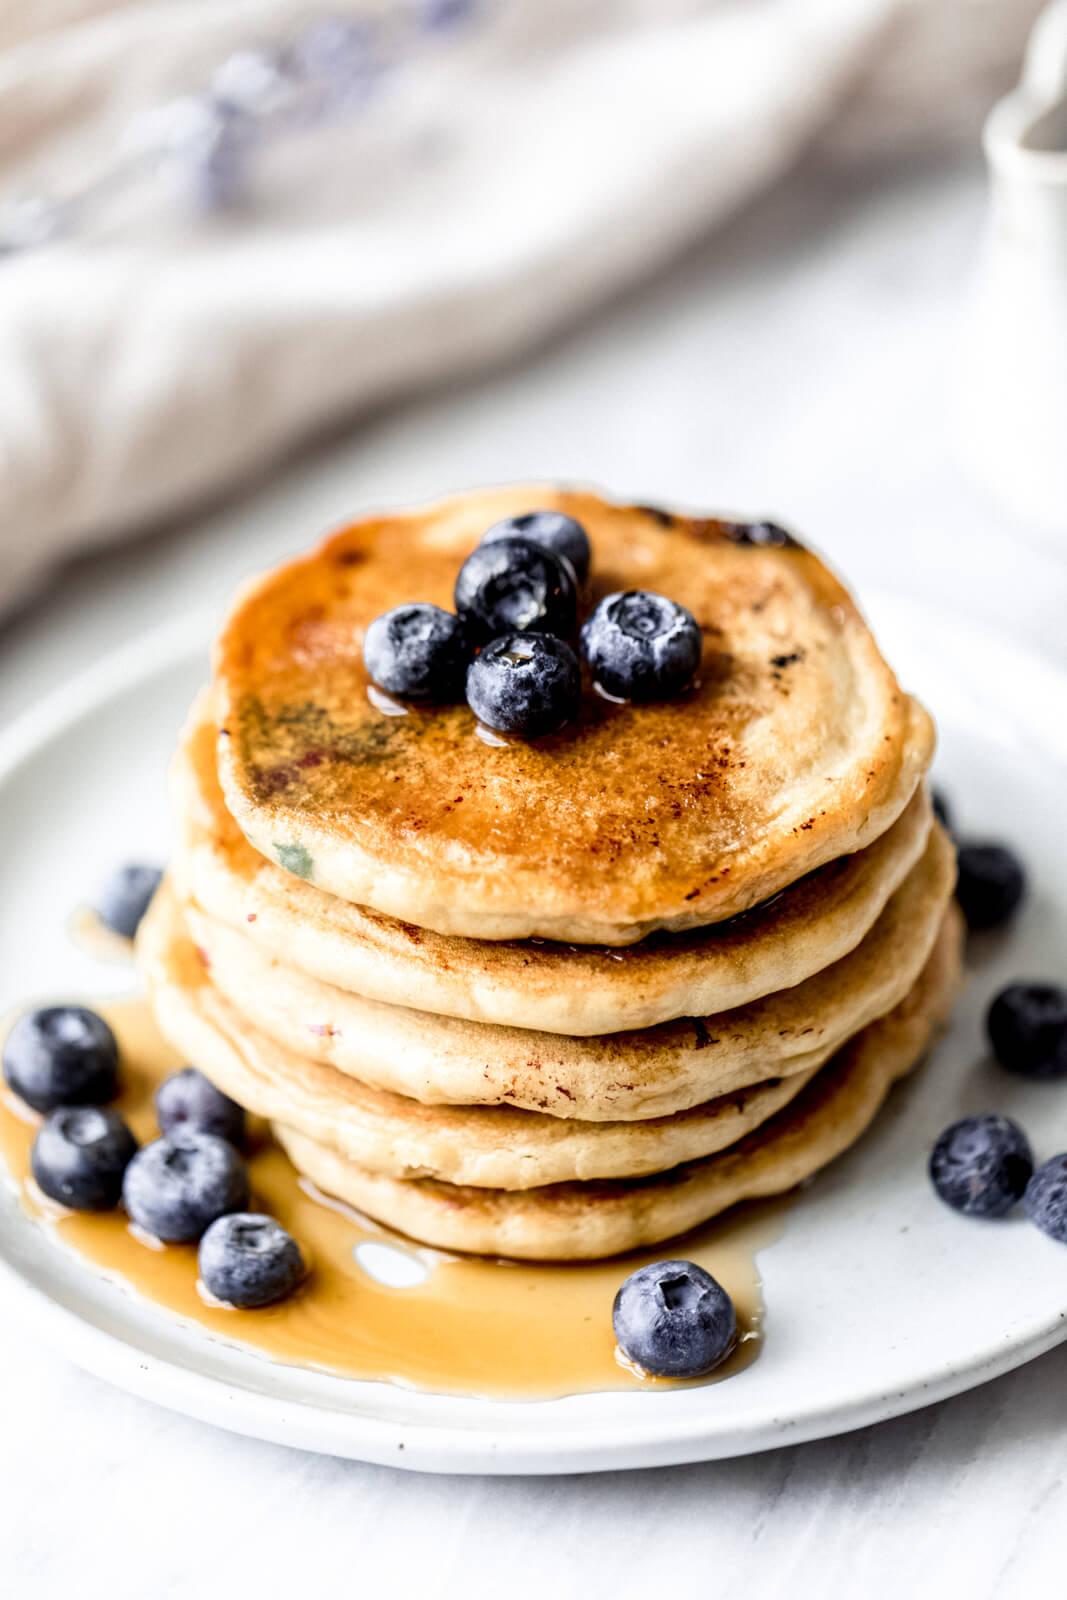 almond flour pancakes with blueberries on top